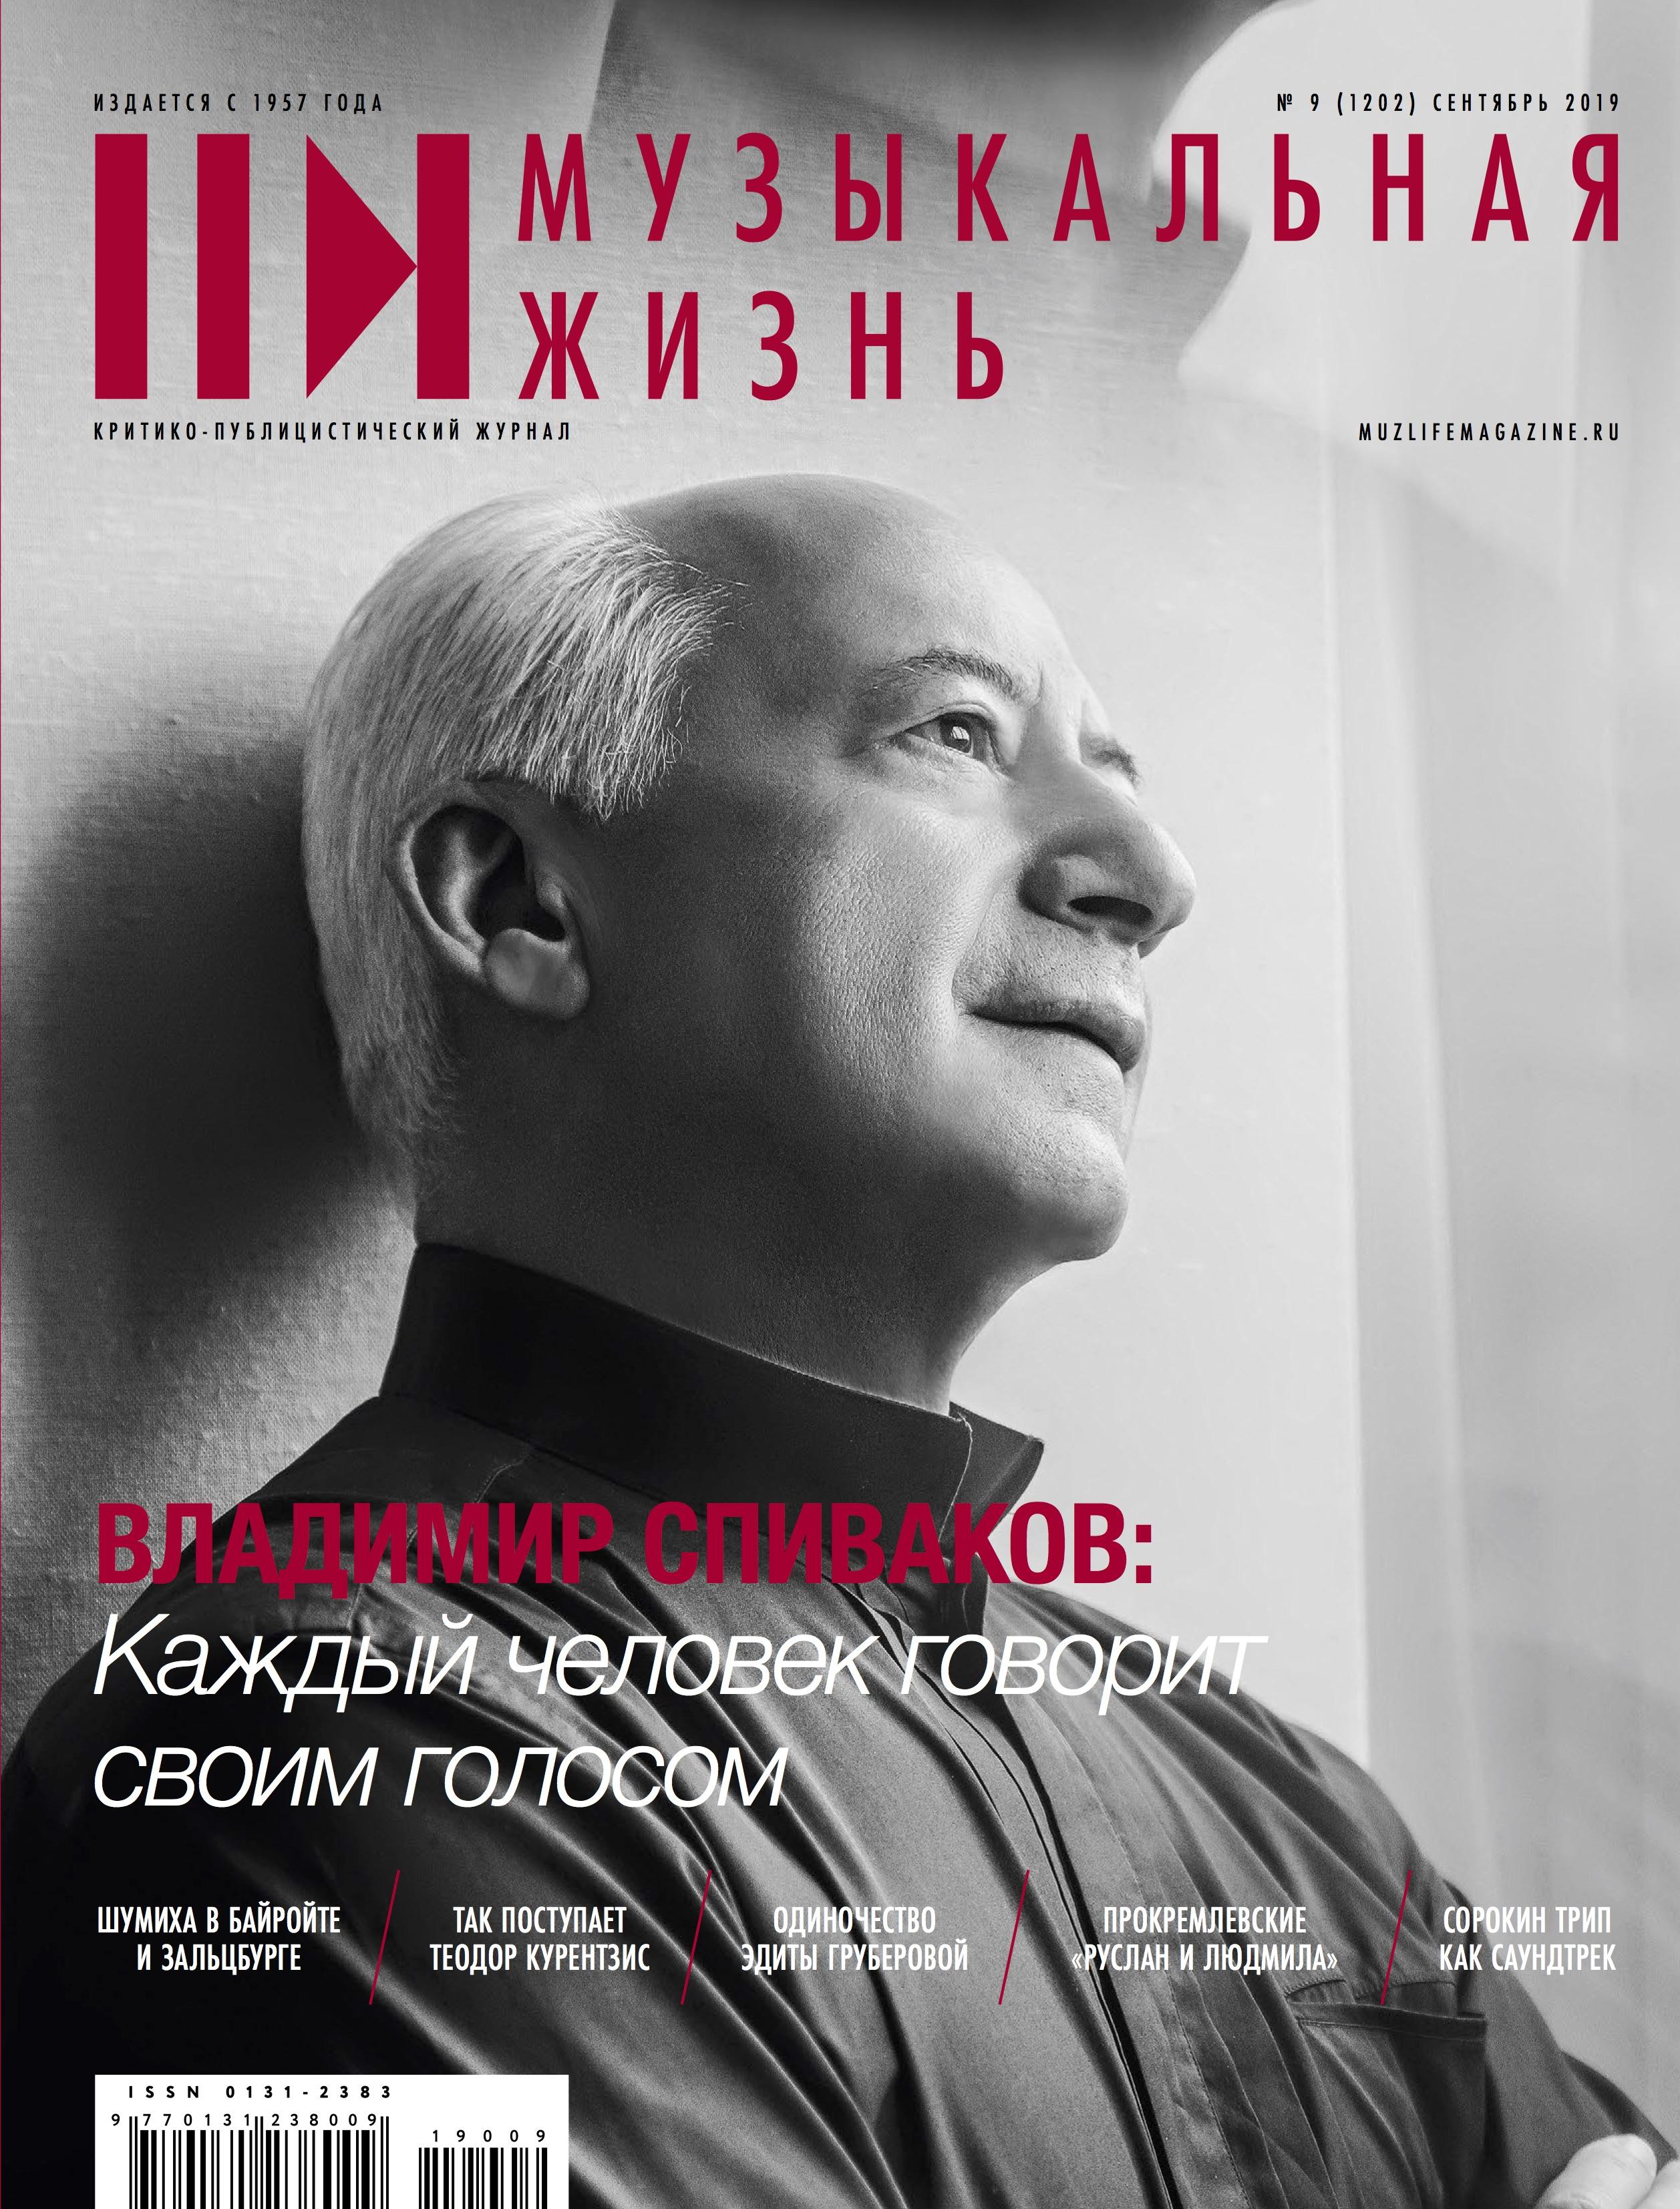 Музыкальная жизнь №9, 2019